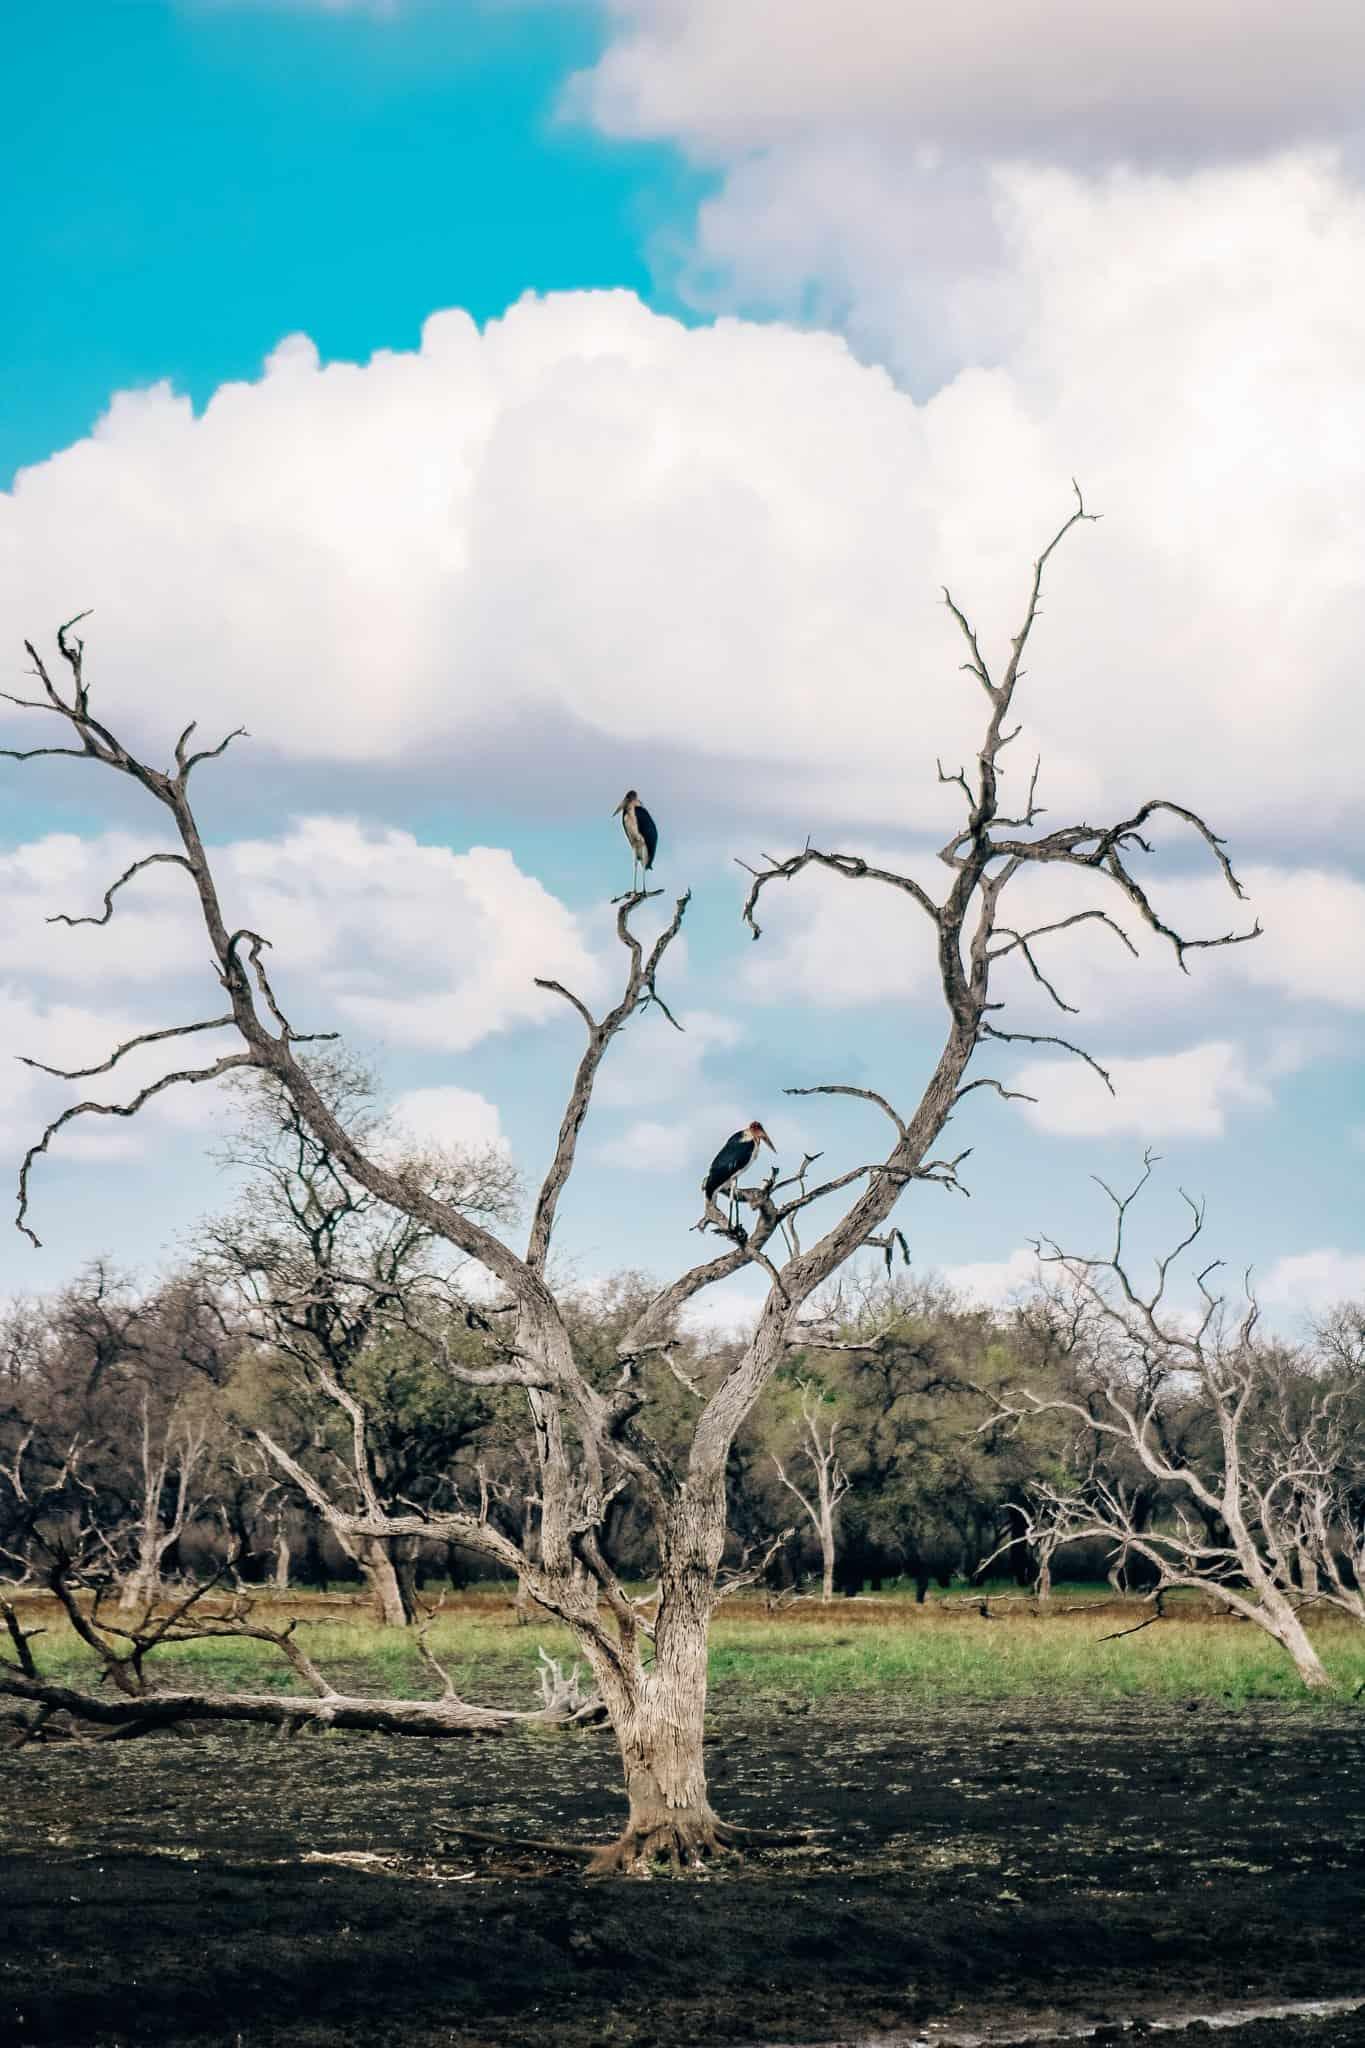 Marabou Storks - African Safari Drive in the Selous Game Reserve